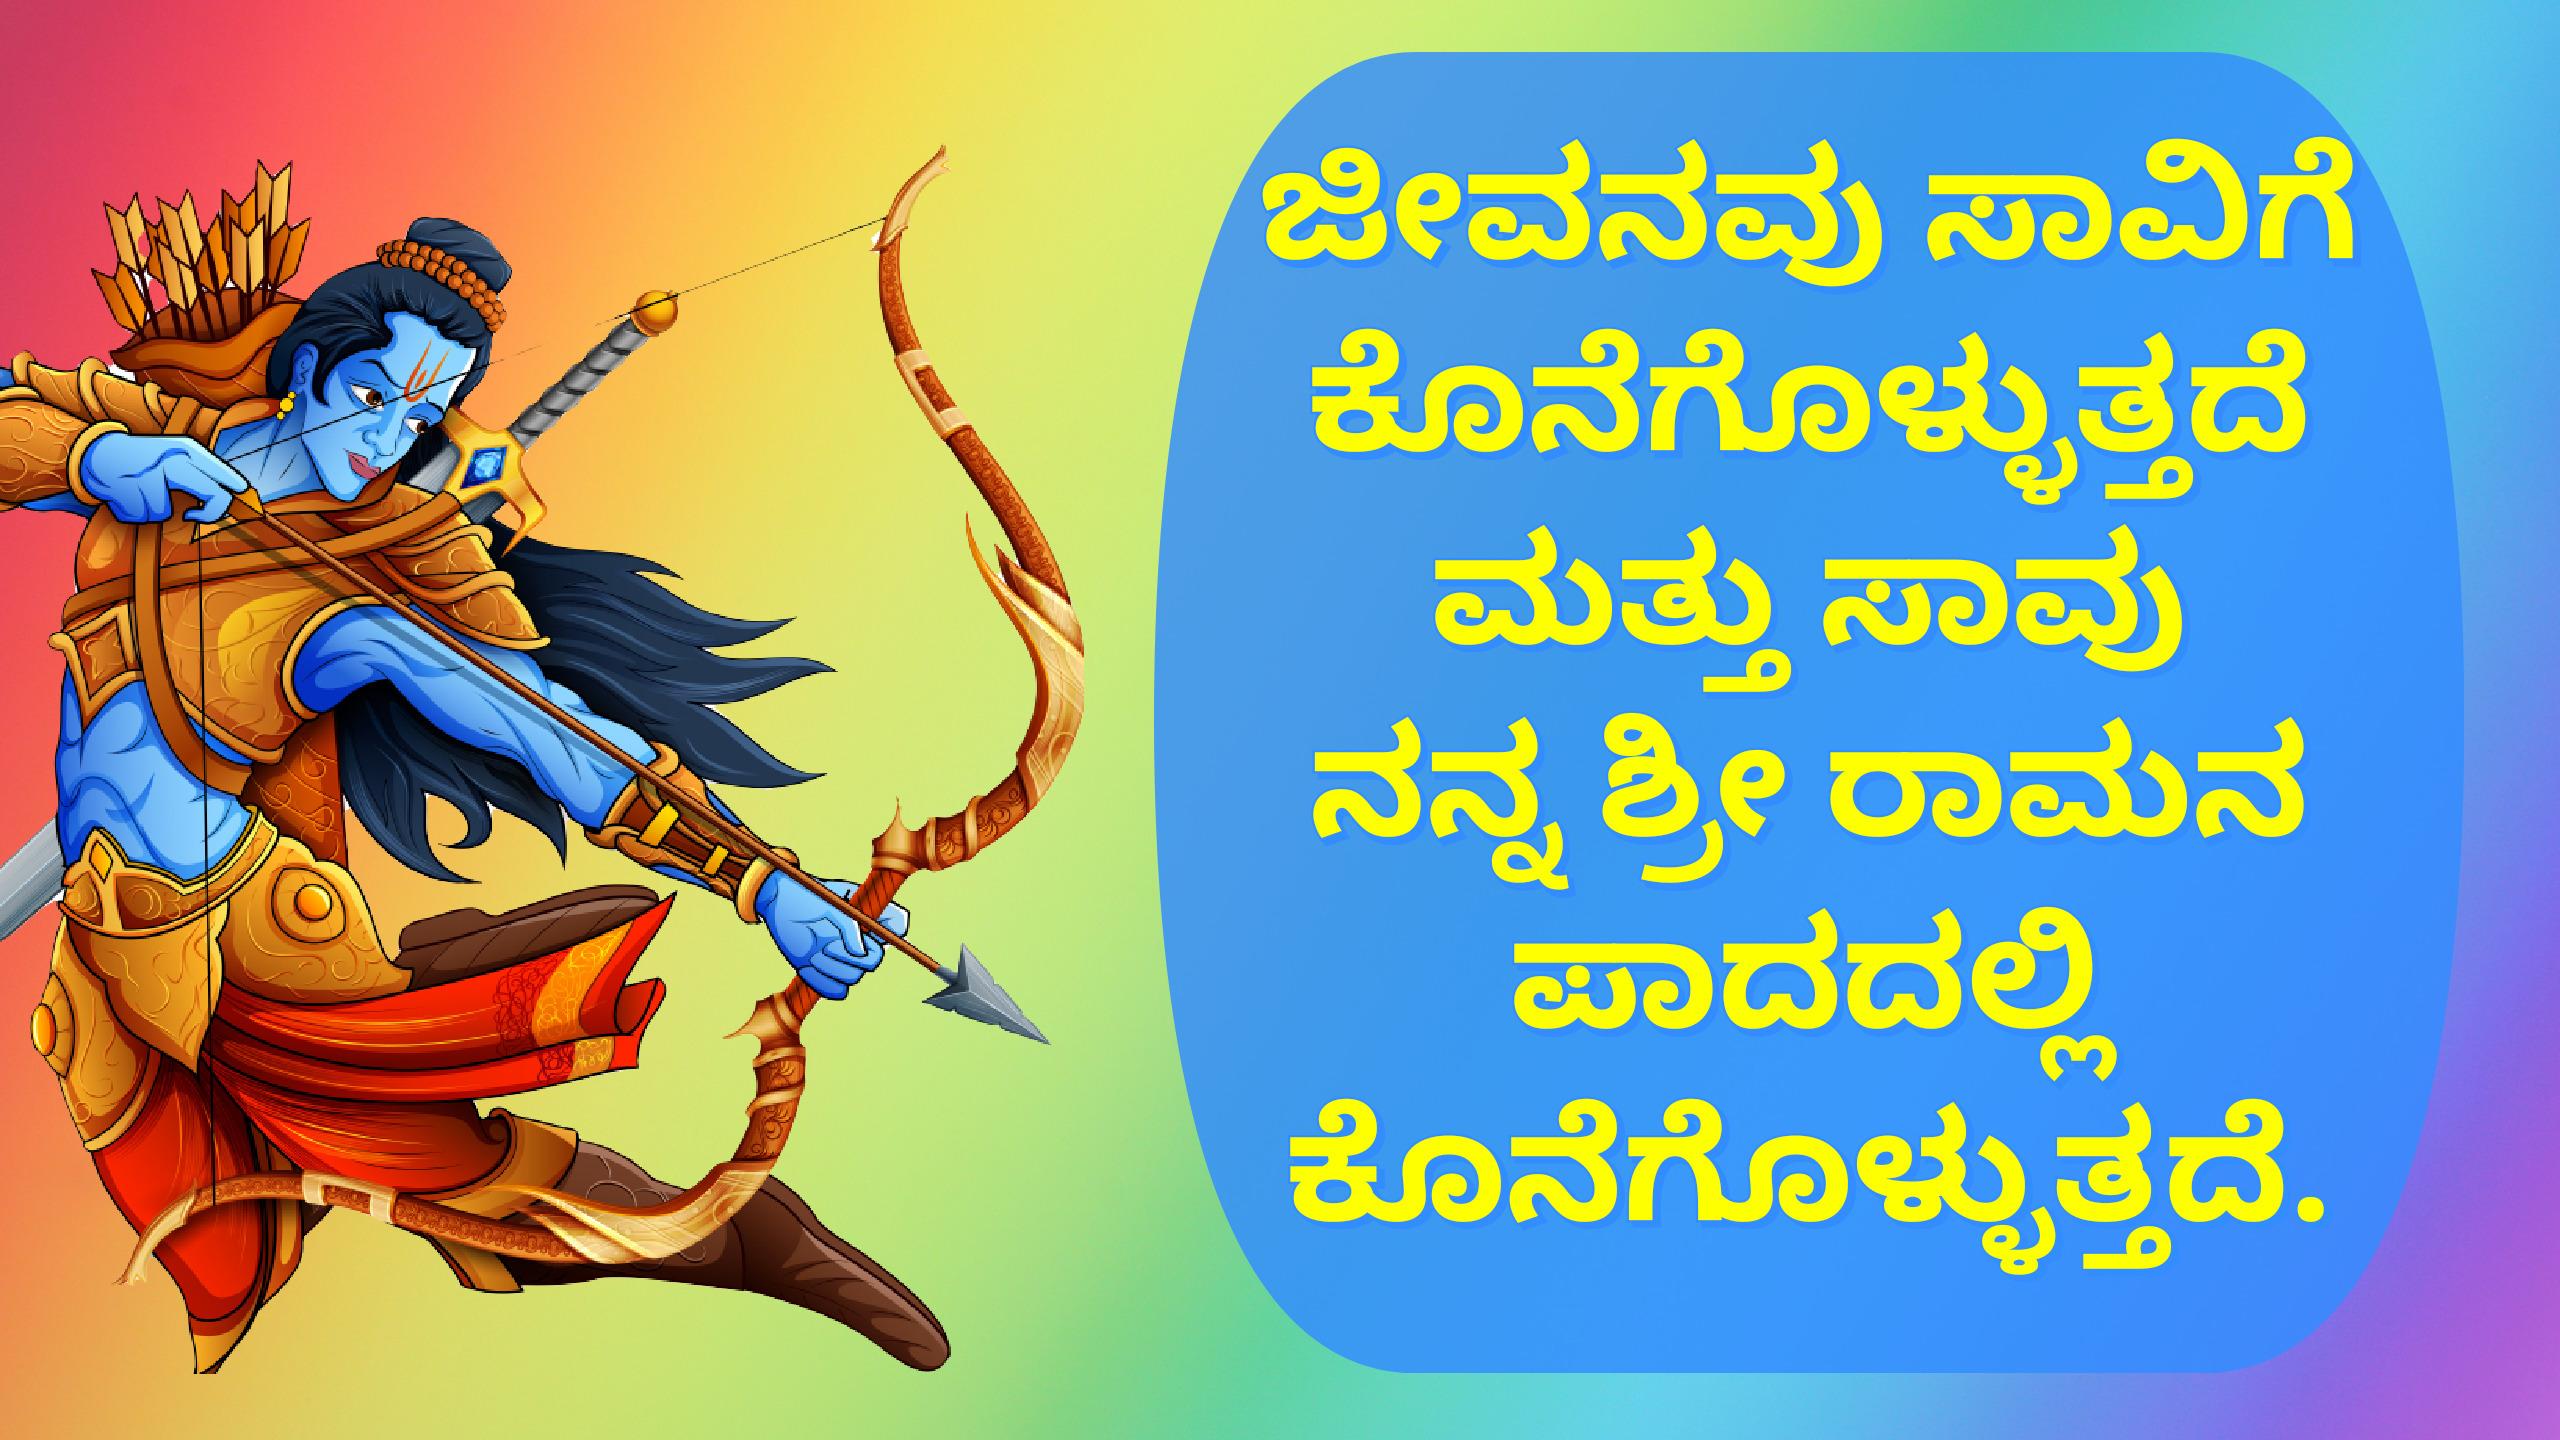 17. Shree Ram Quotes in Kannada